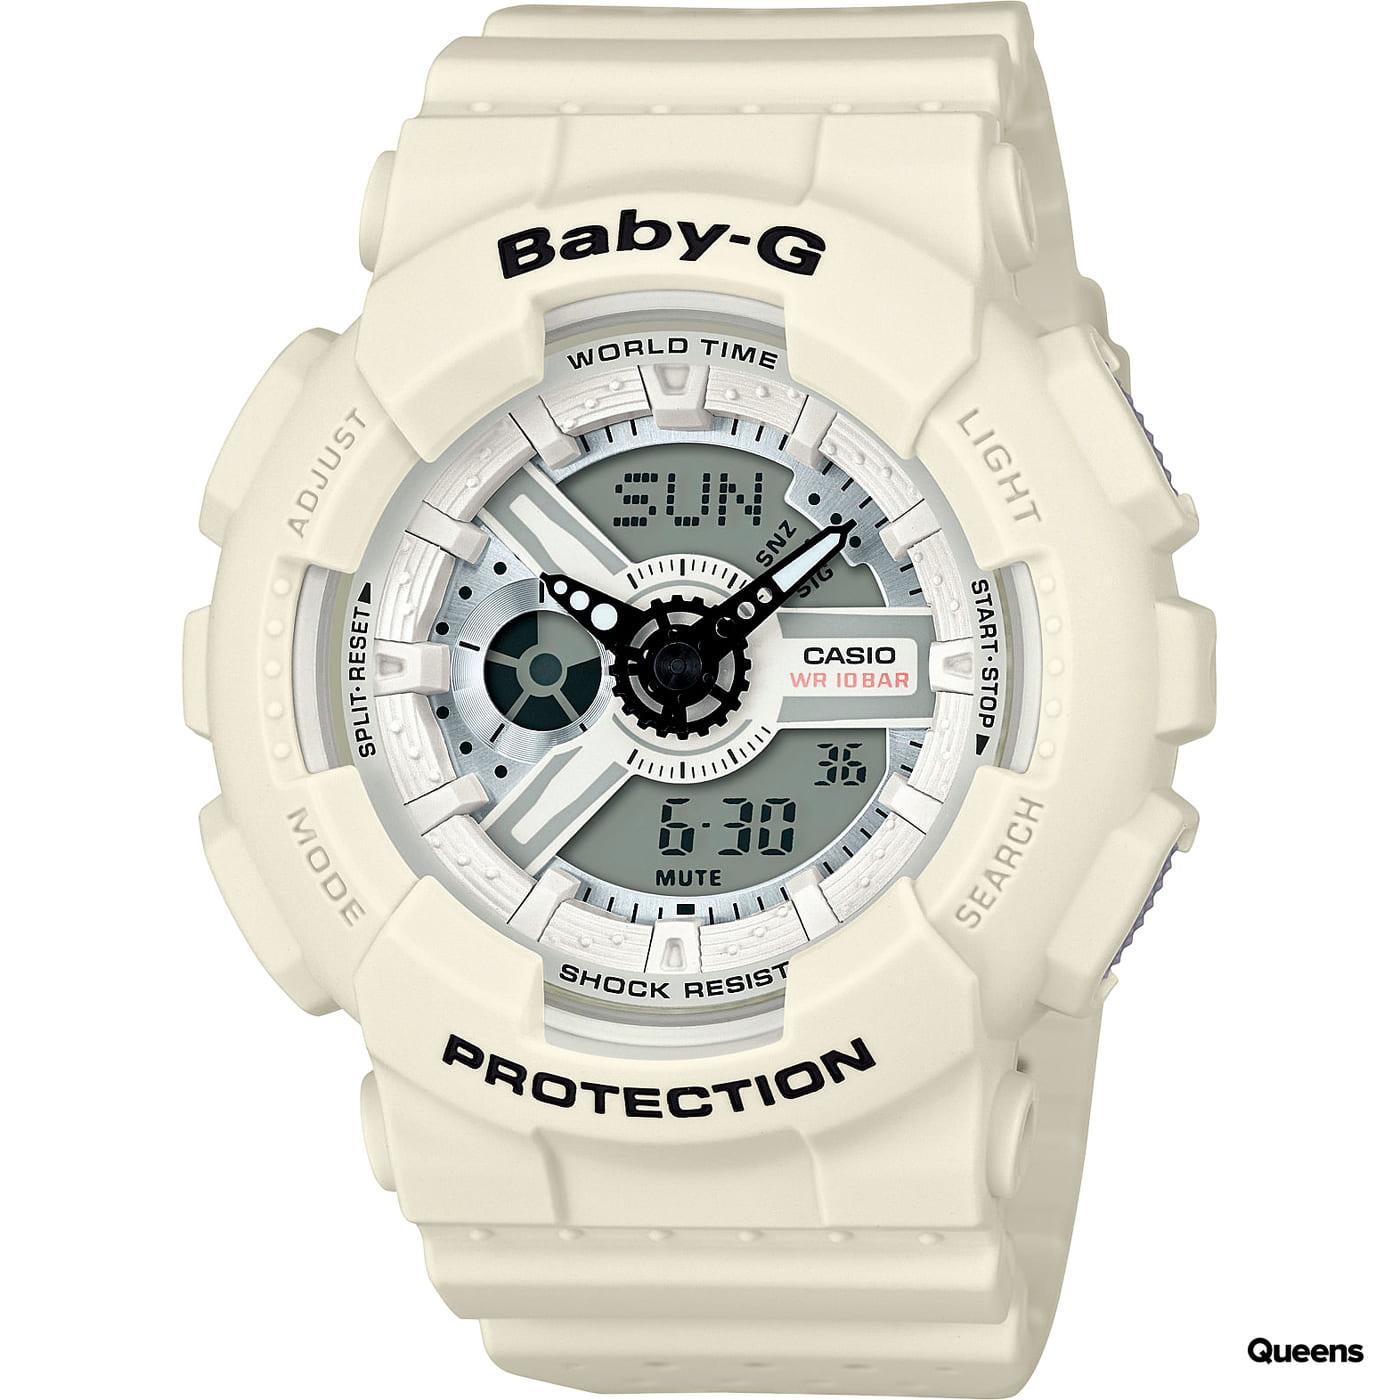 Casio Baby-G BA 110PP-7AER creme